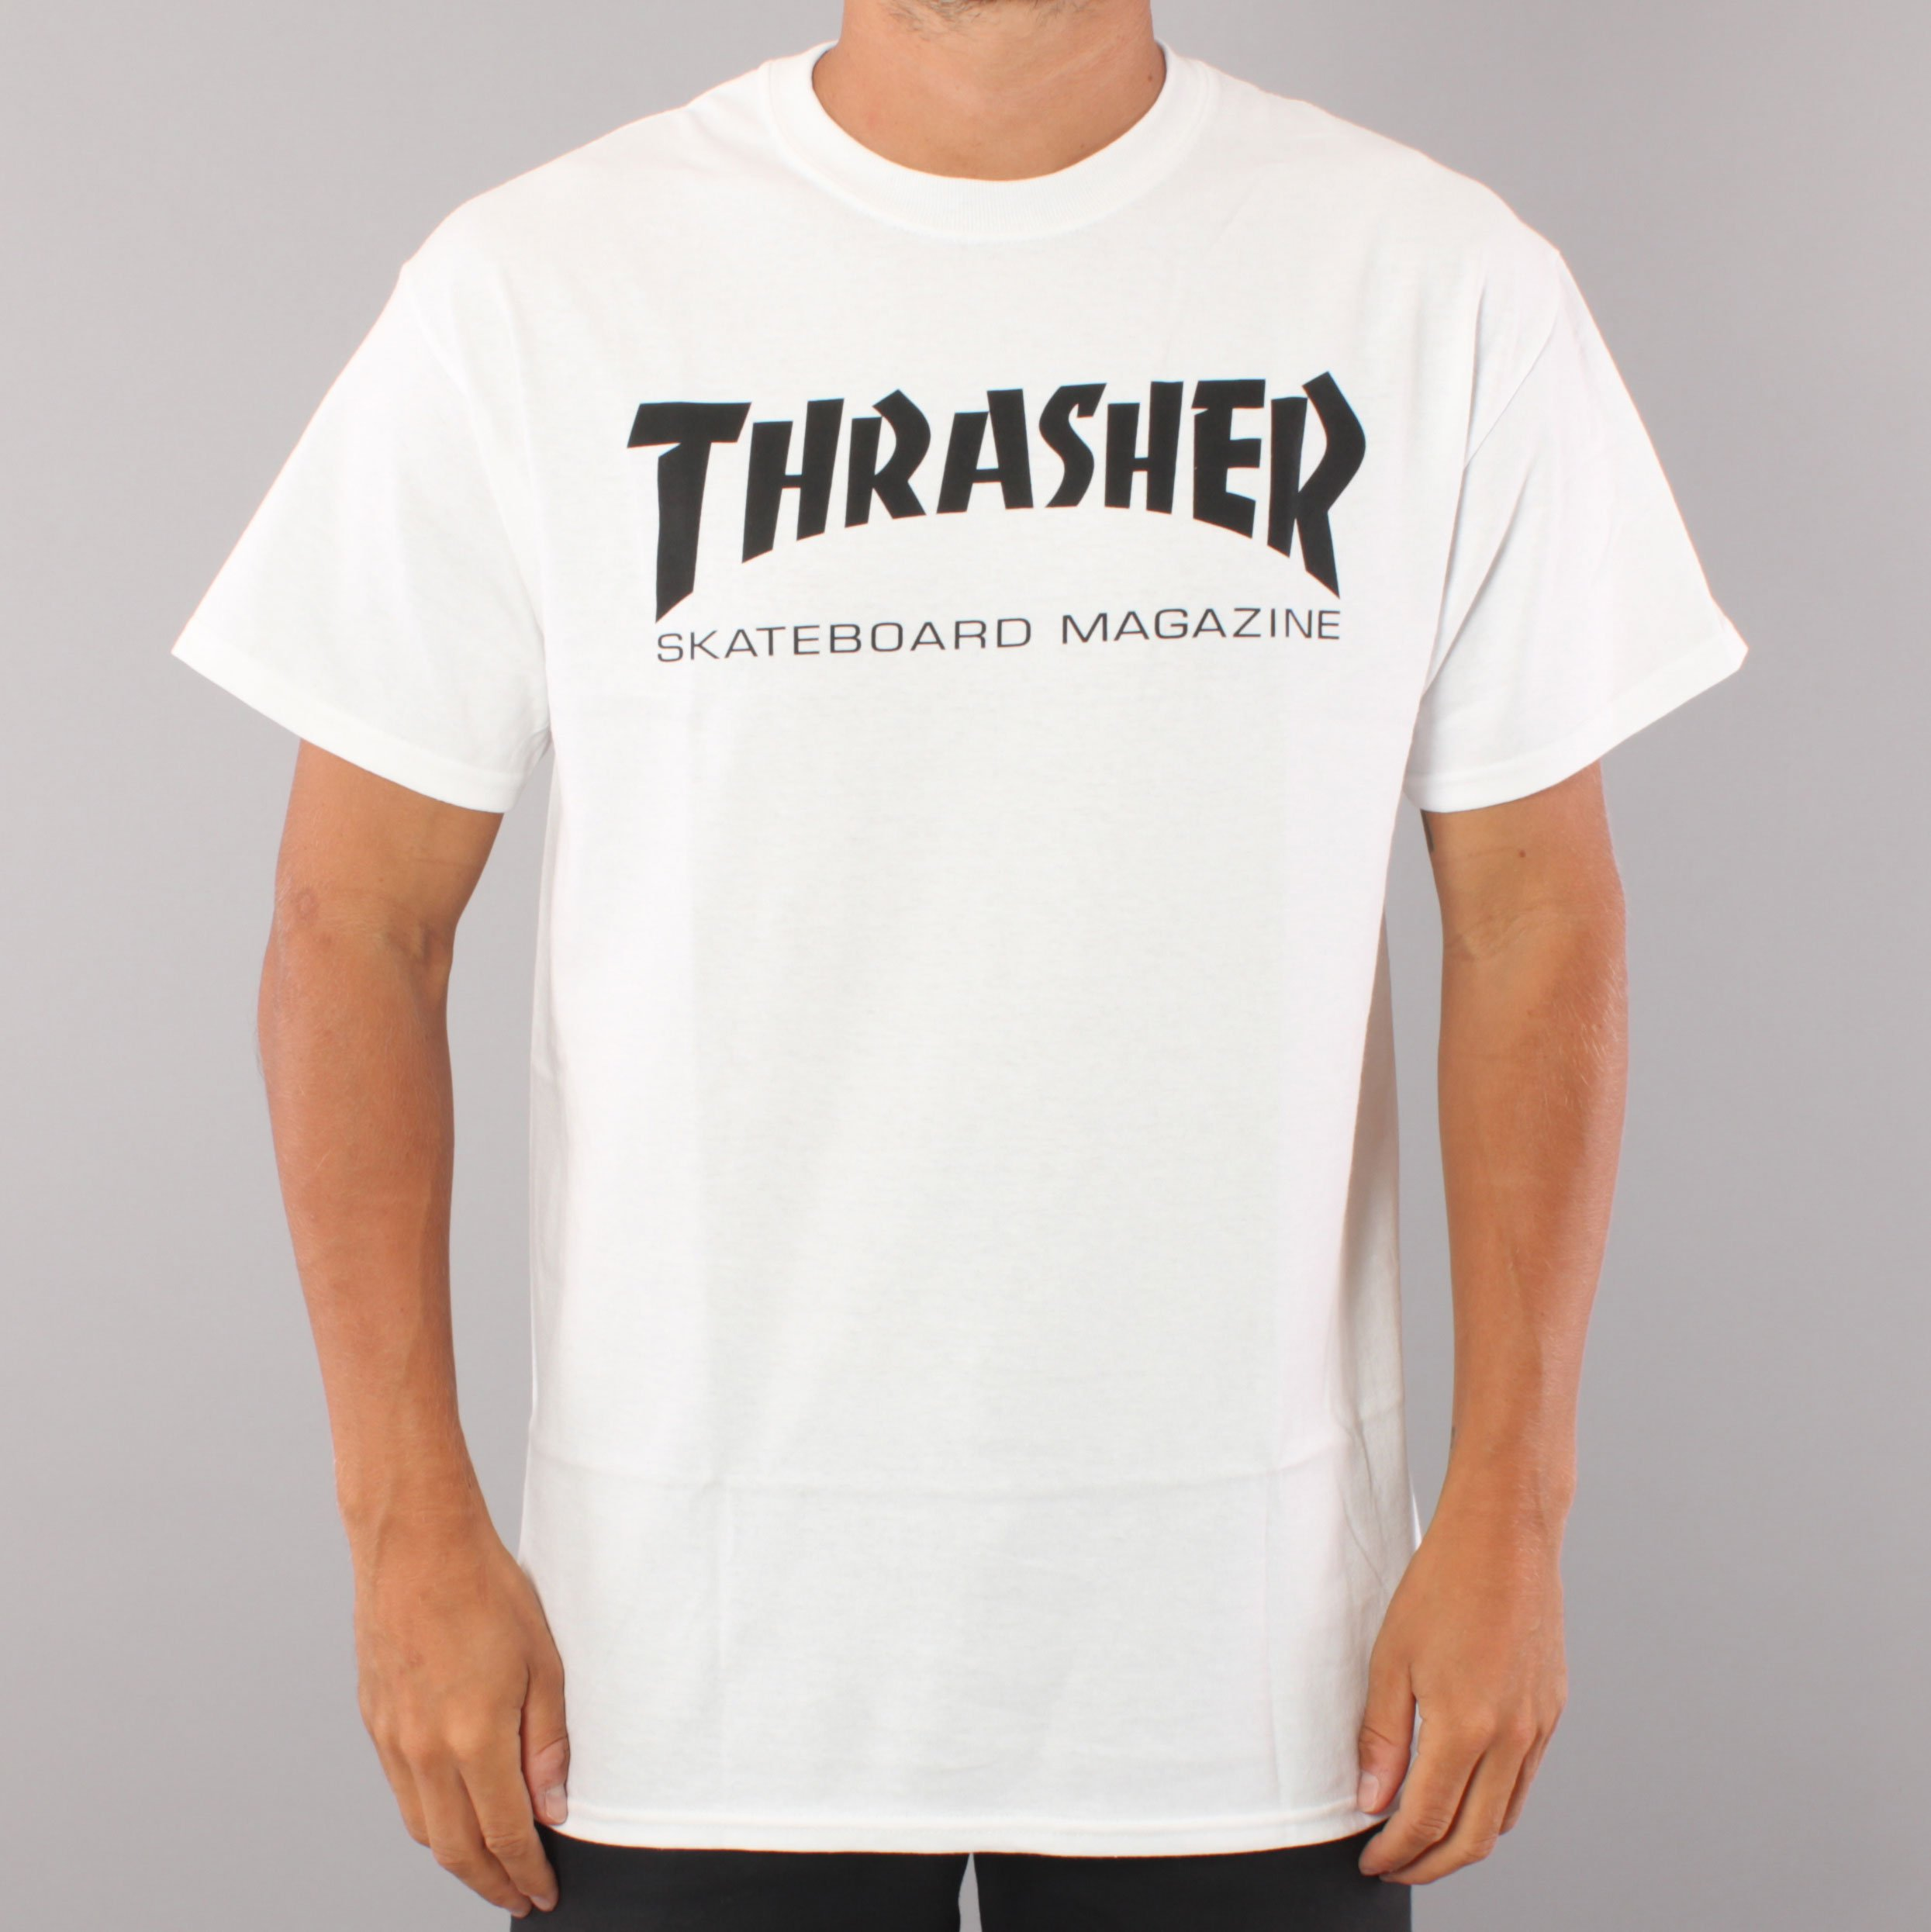 Thrasher Skate Mag T-shirt - White